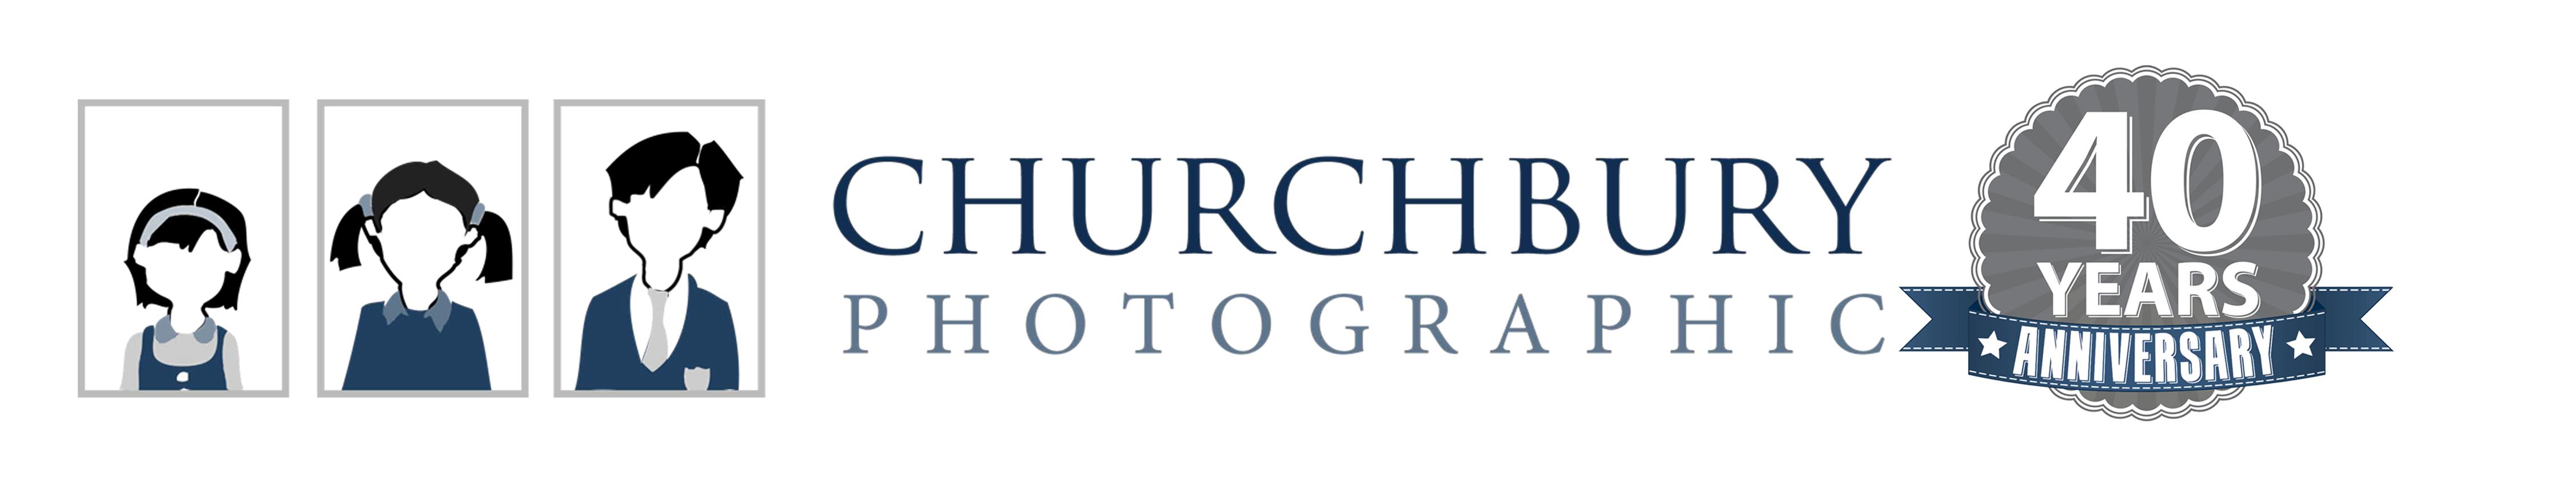 Churchbury Photographic Services Ltd Logo